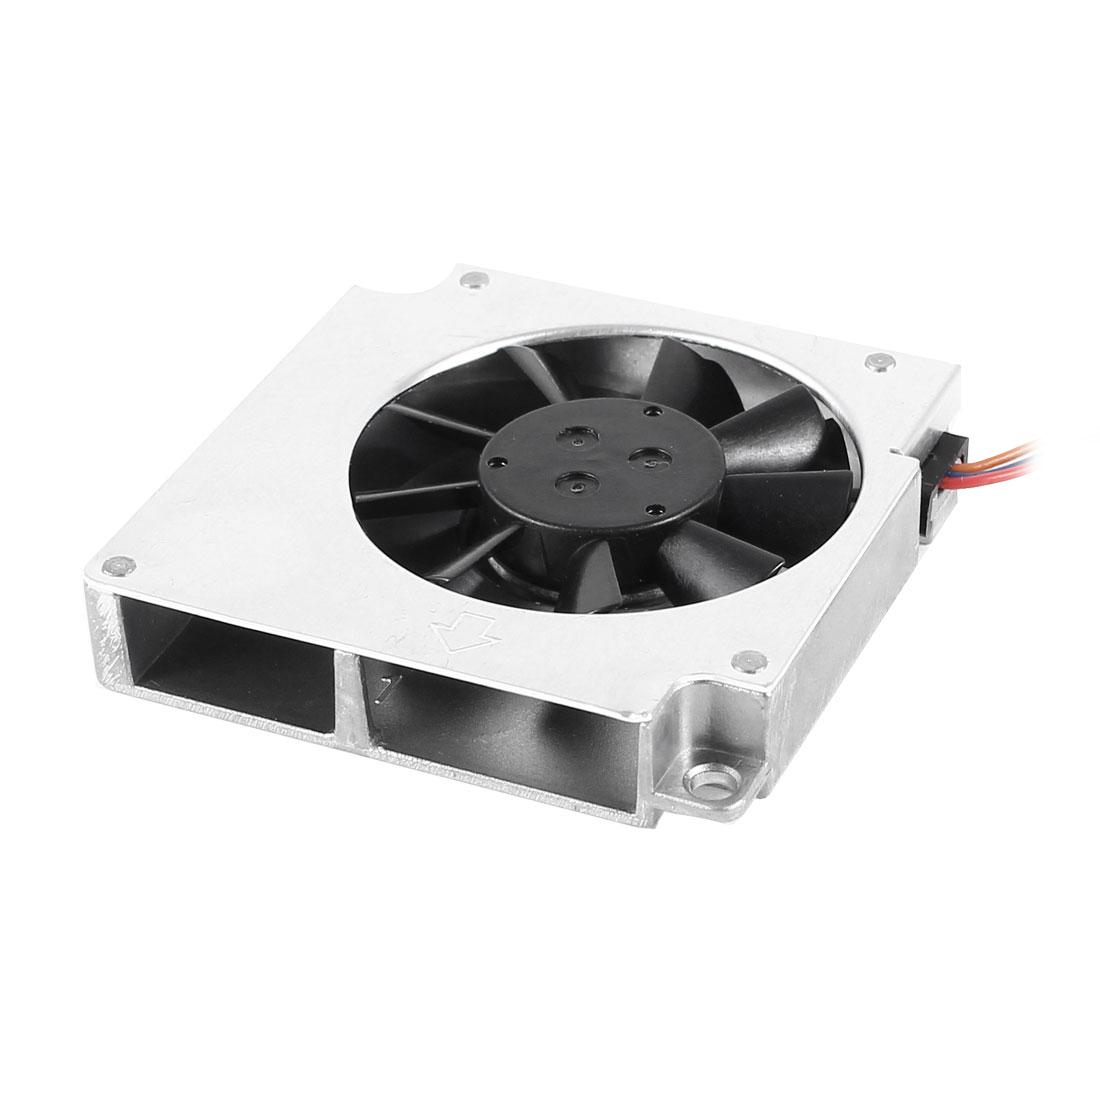 Black Silver Tone Plastic VGA Heatsink Cooler Cooling Fan DC 12V 0.08A